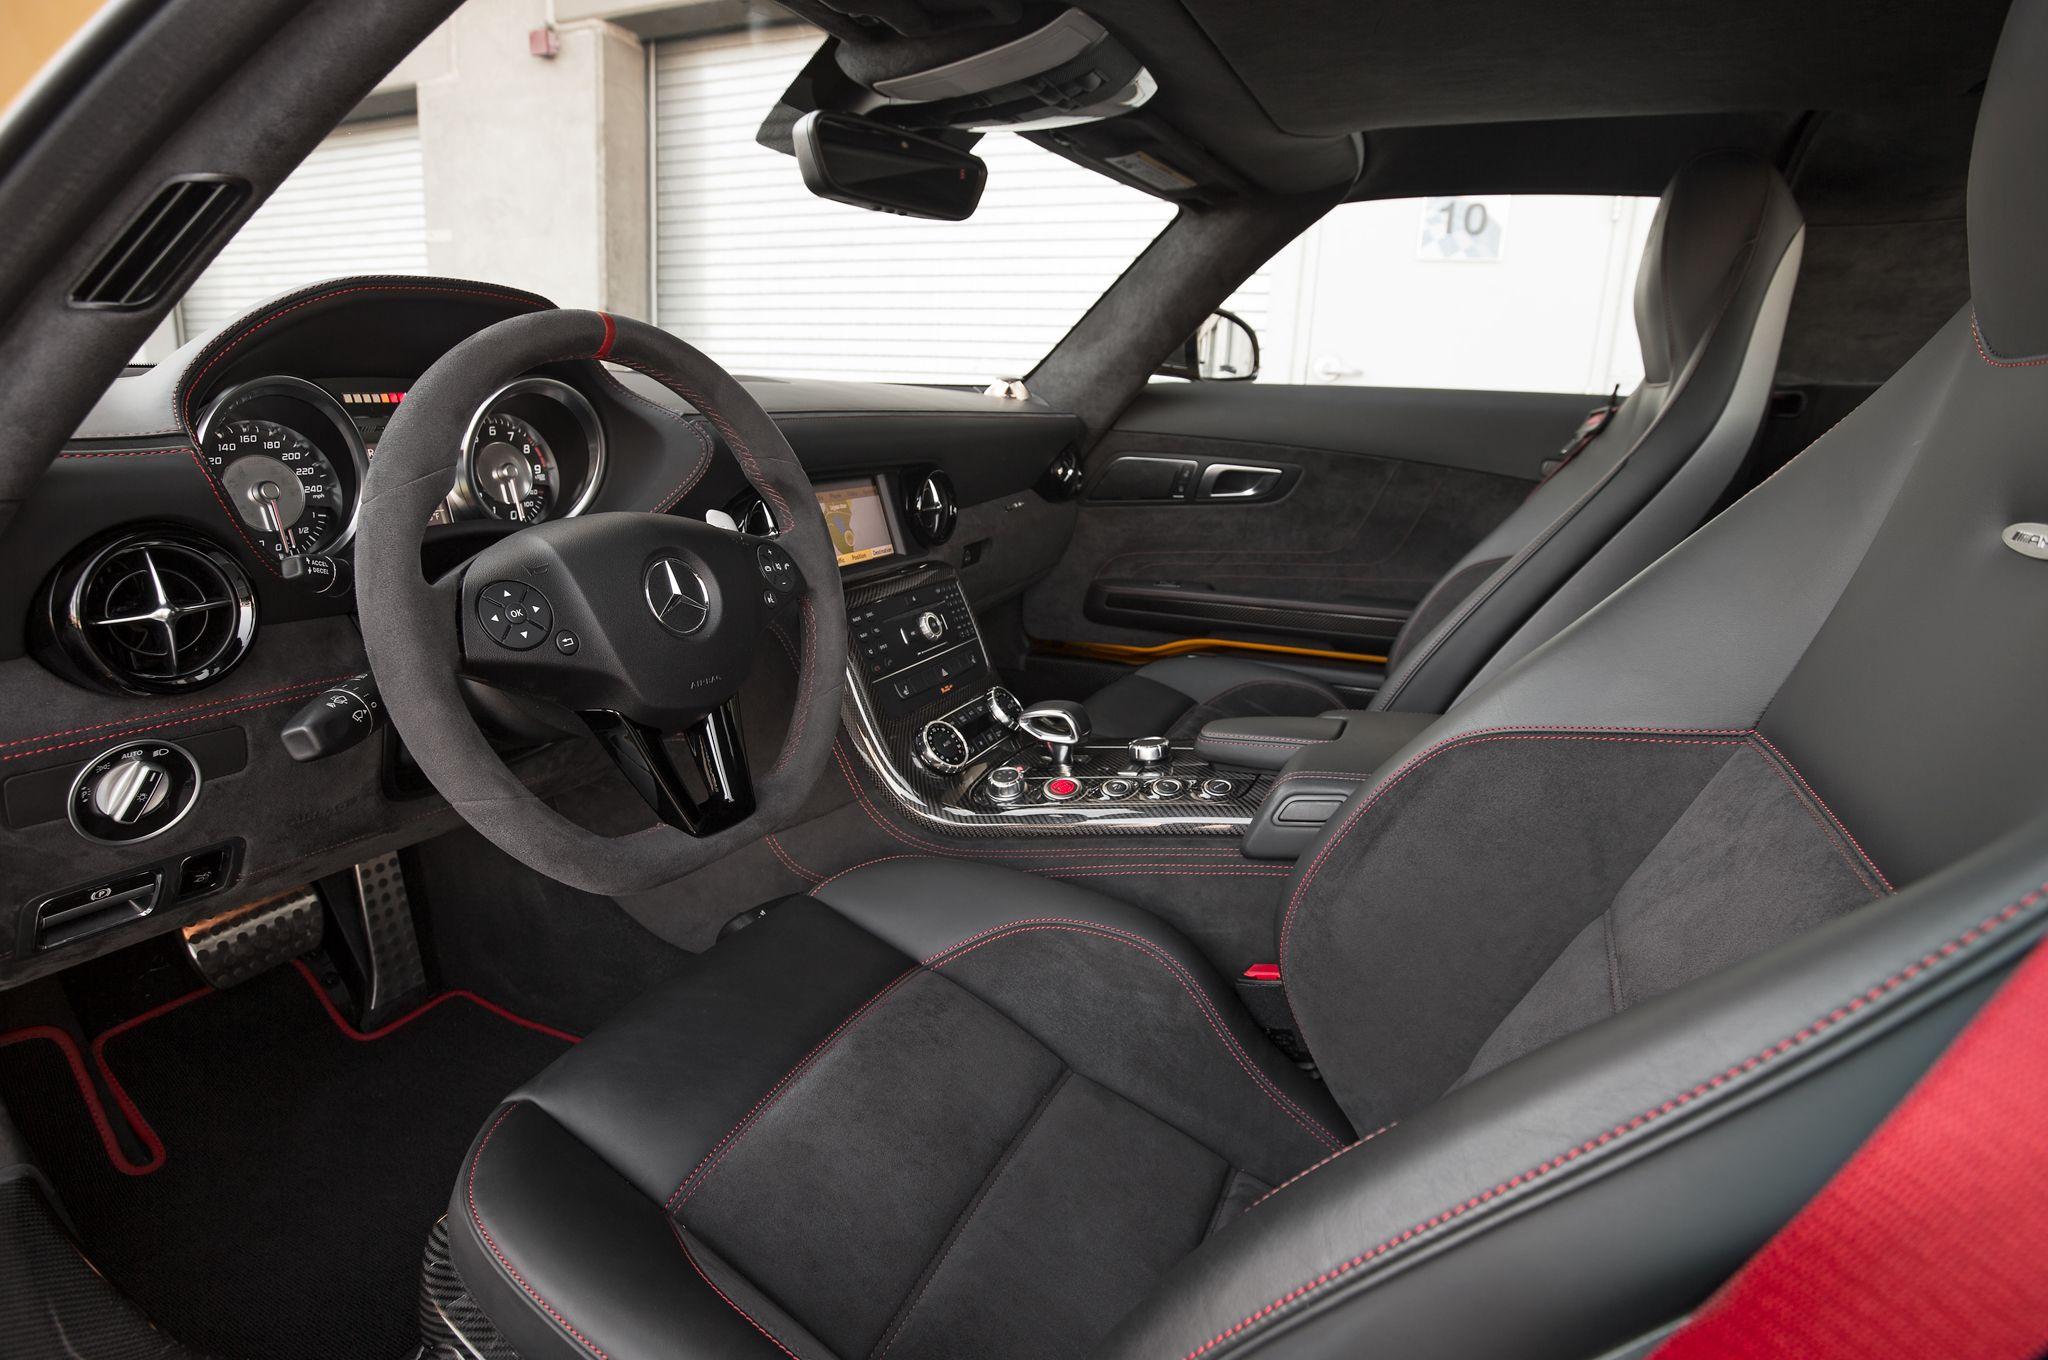 http://carskin.info/2015/02/25/mercedes-sls-amg-black-series ...